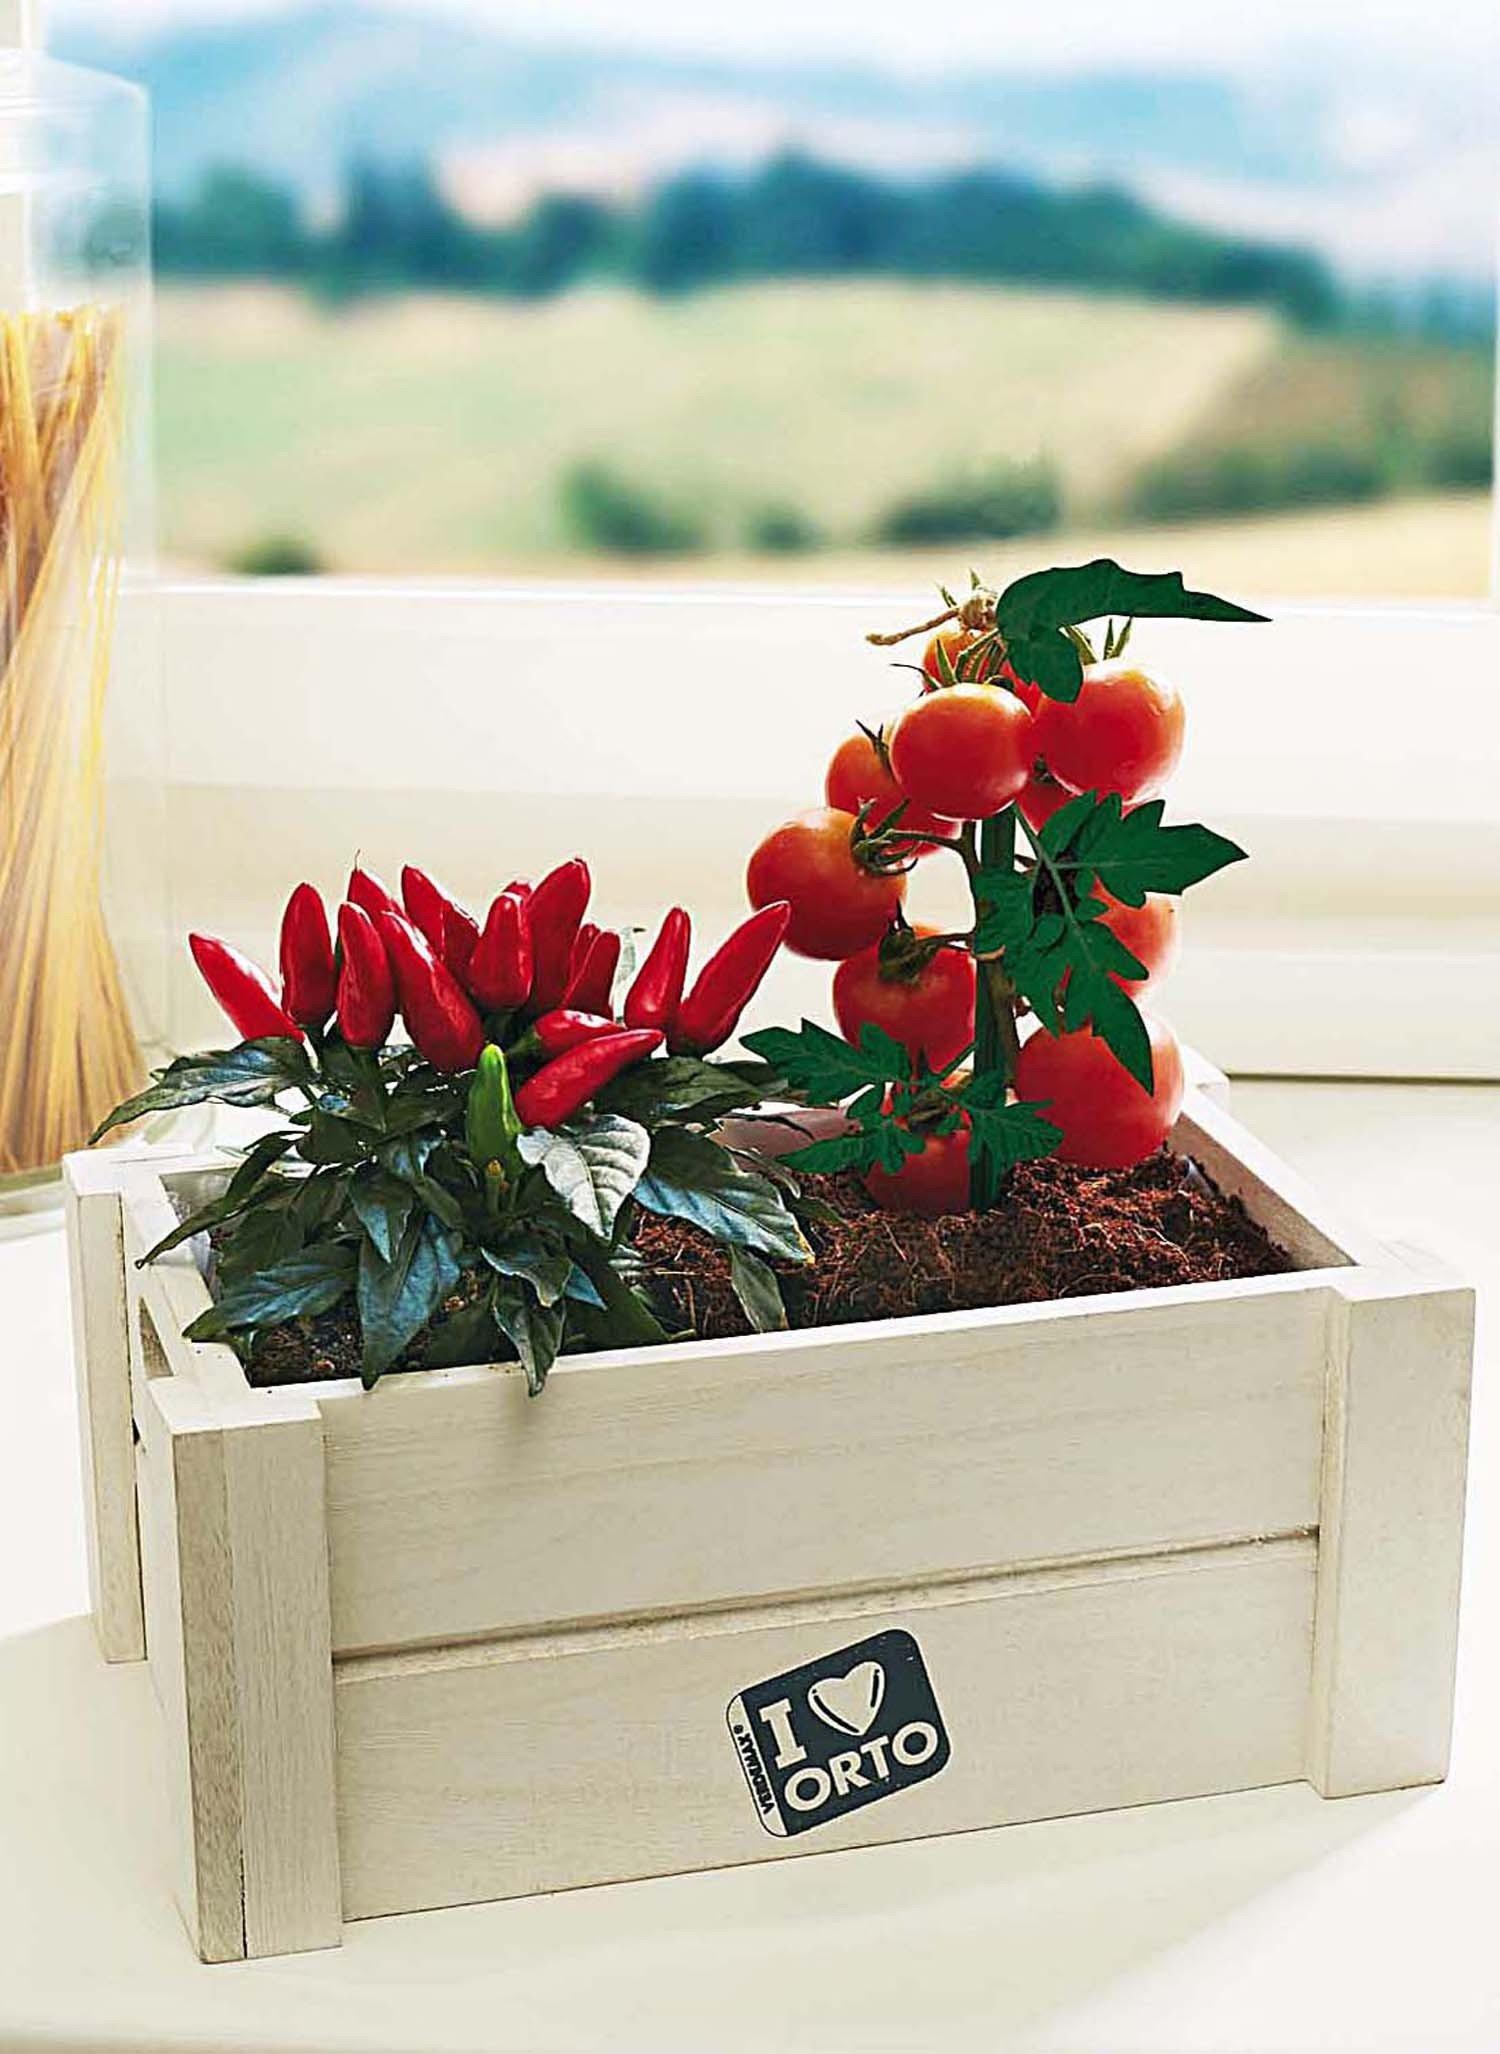 Jardin d'inter.Cherry/Piments